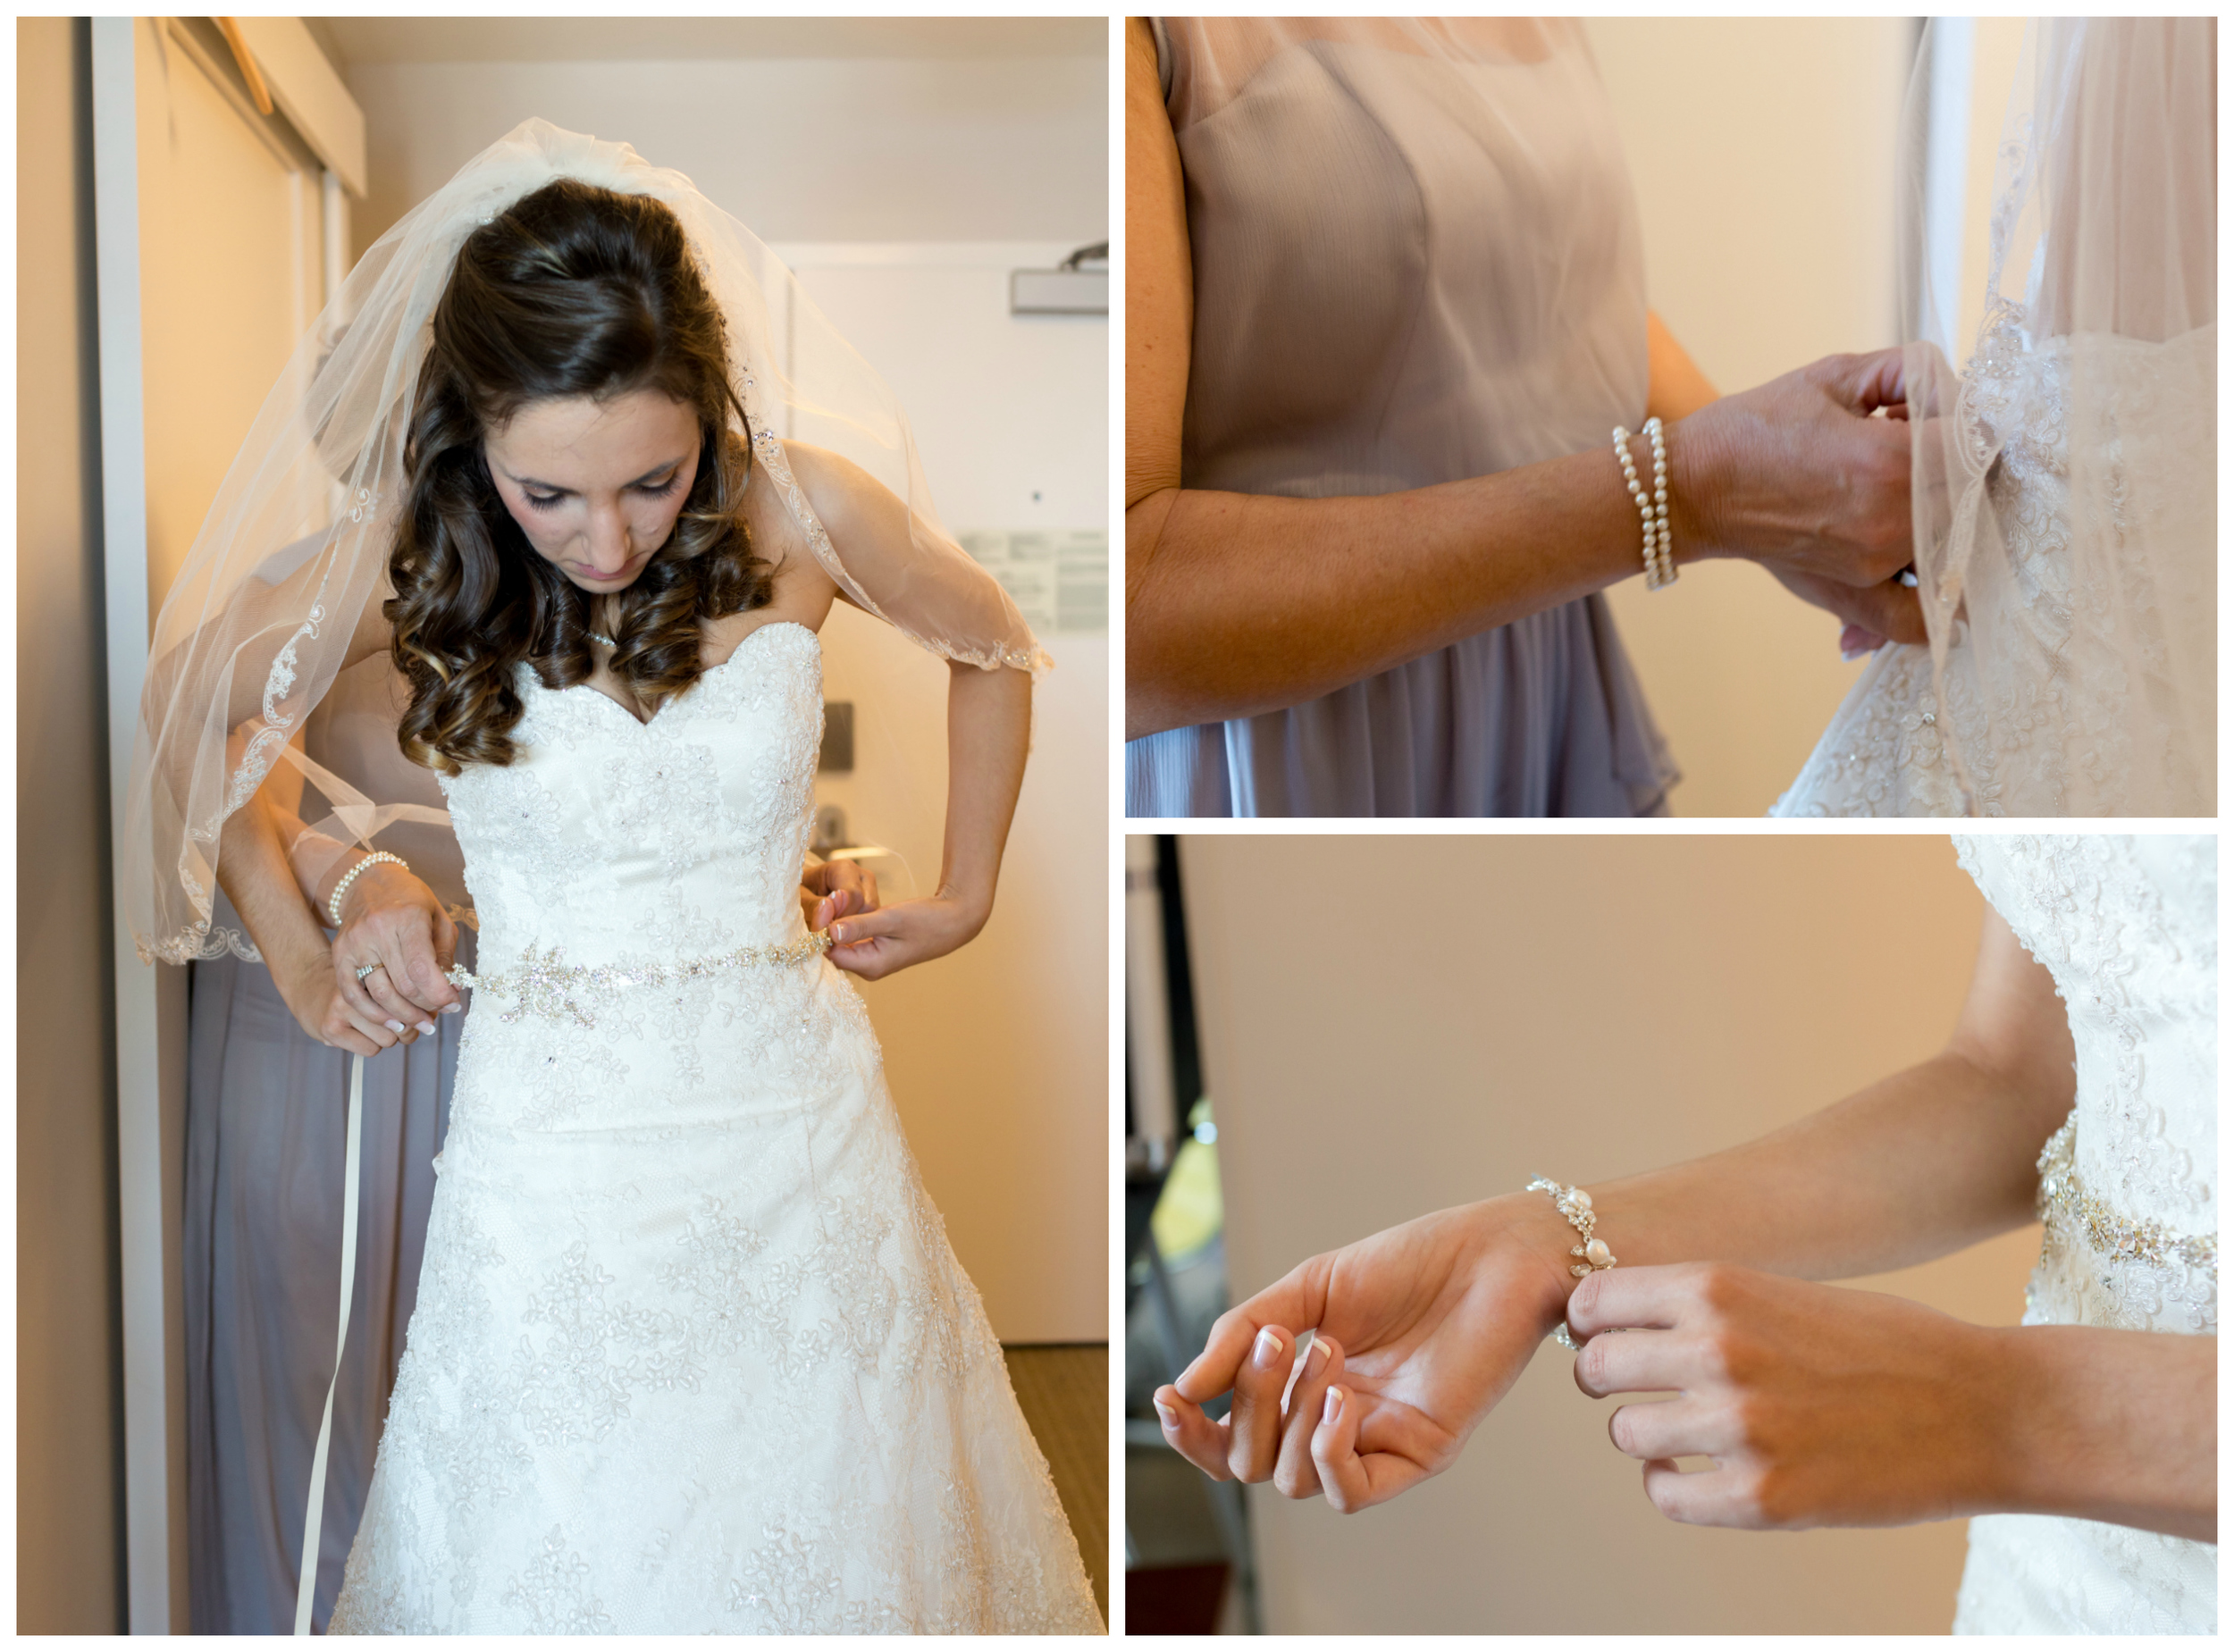 bride getting dressed with belt, bracelet, mom zipping dress